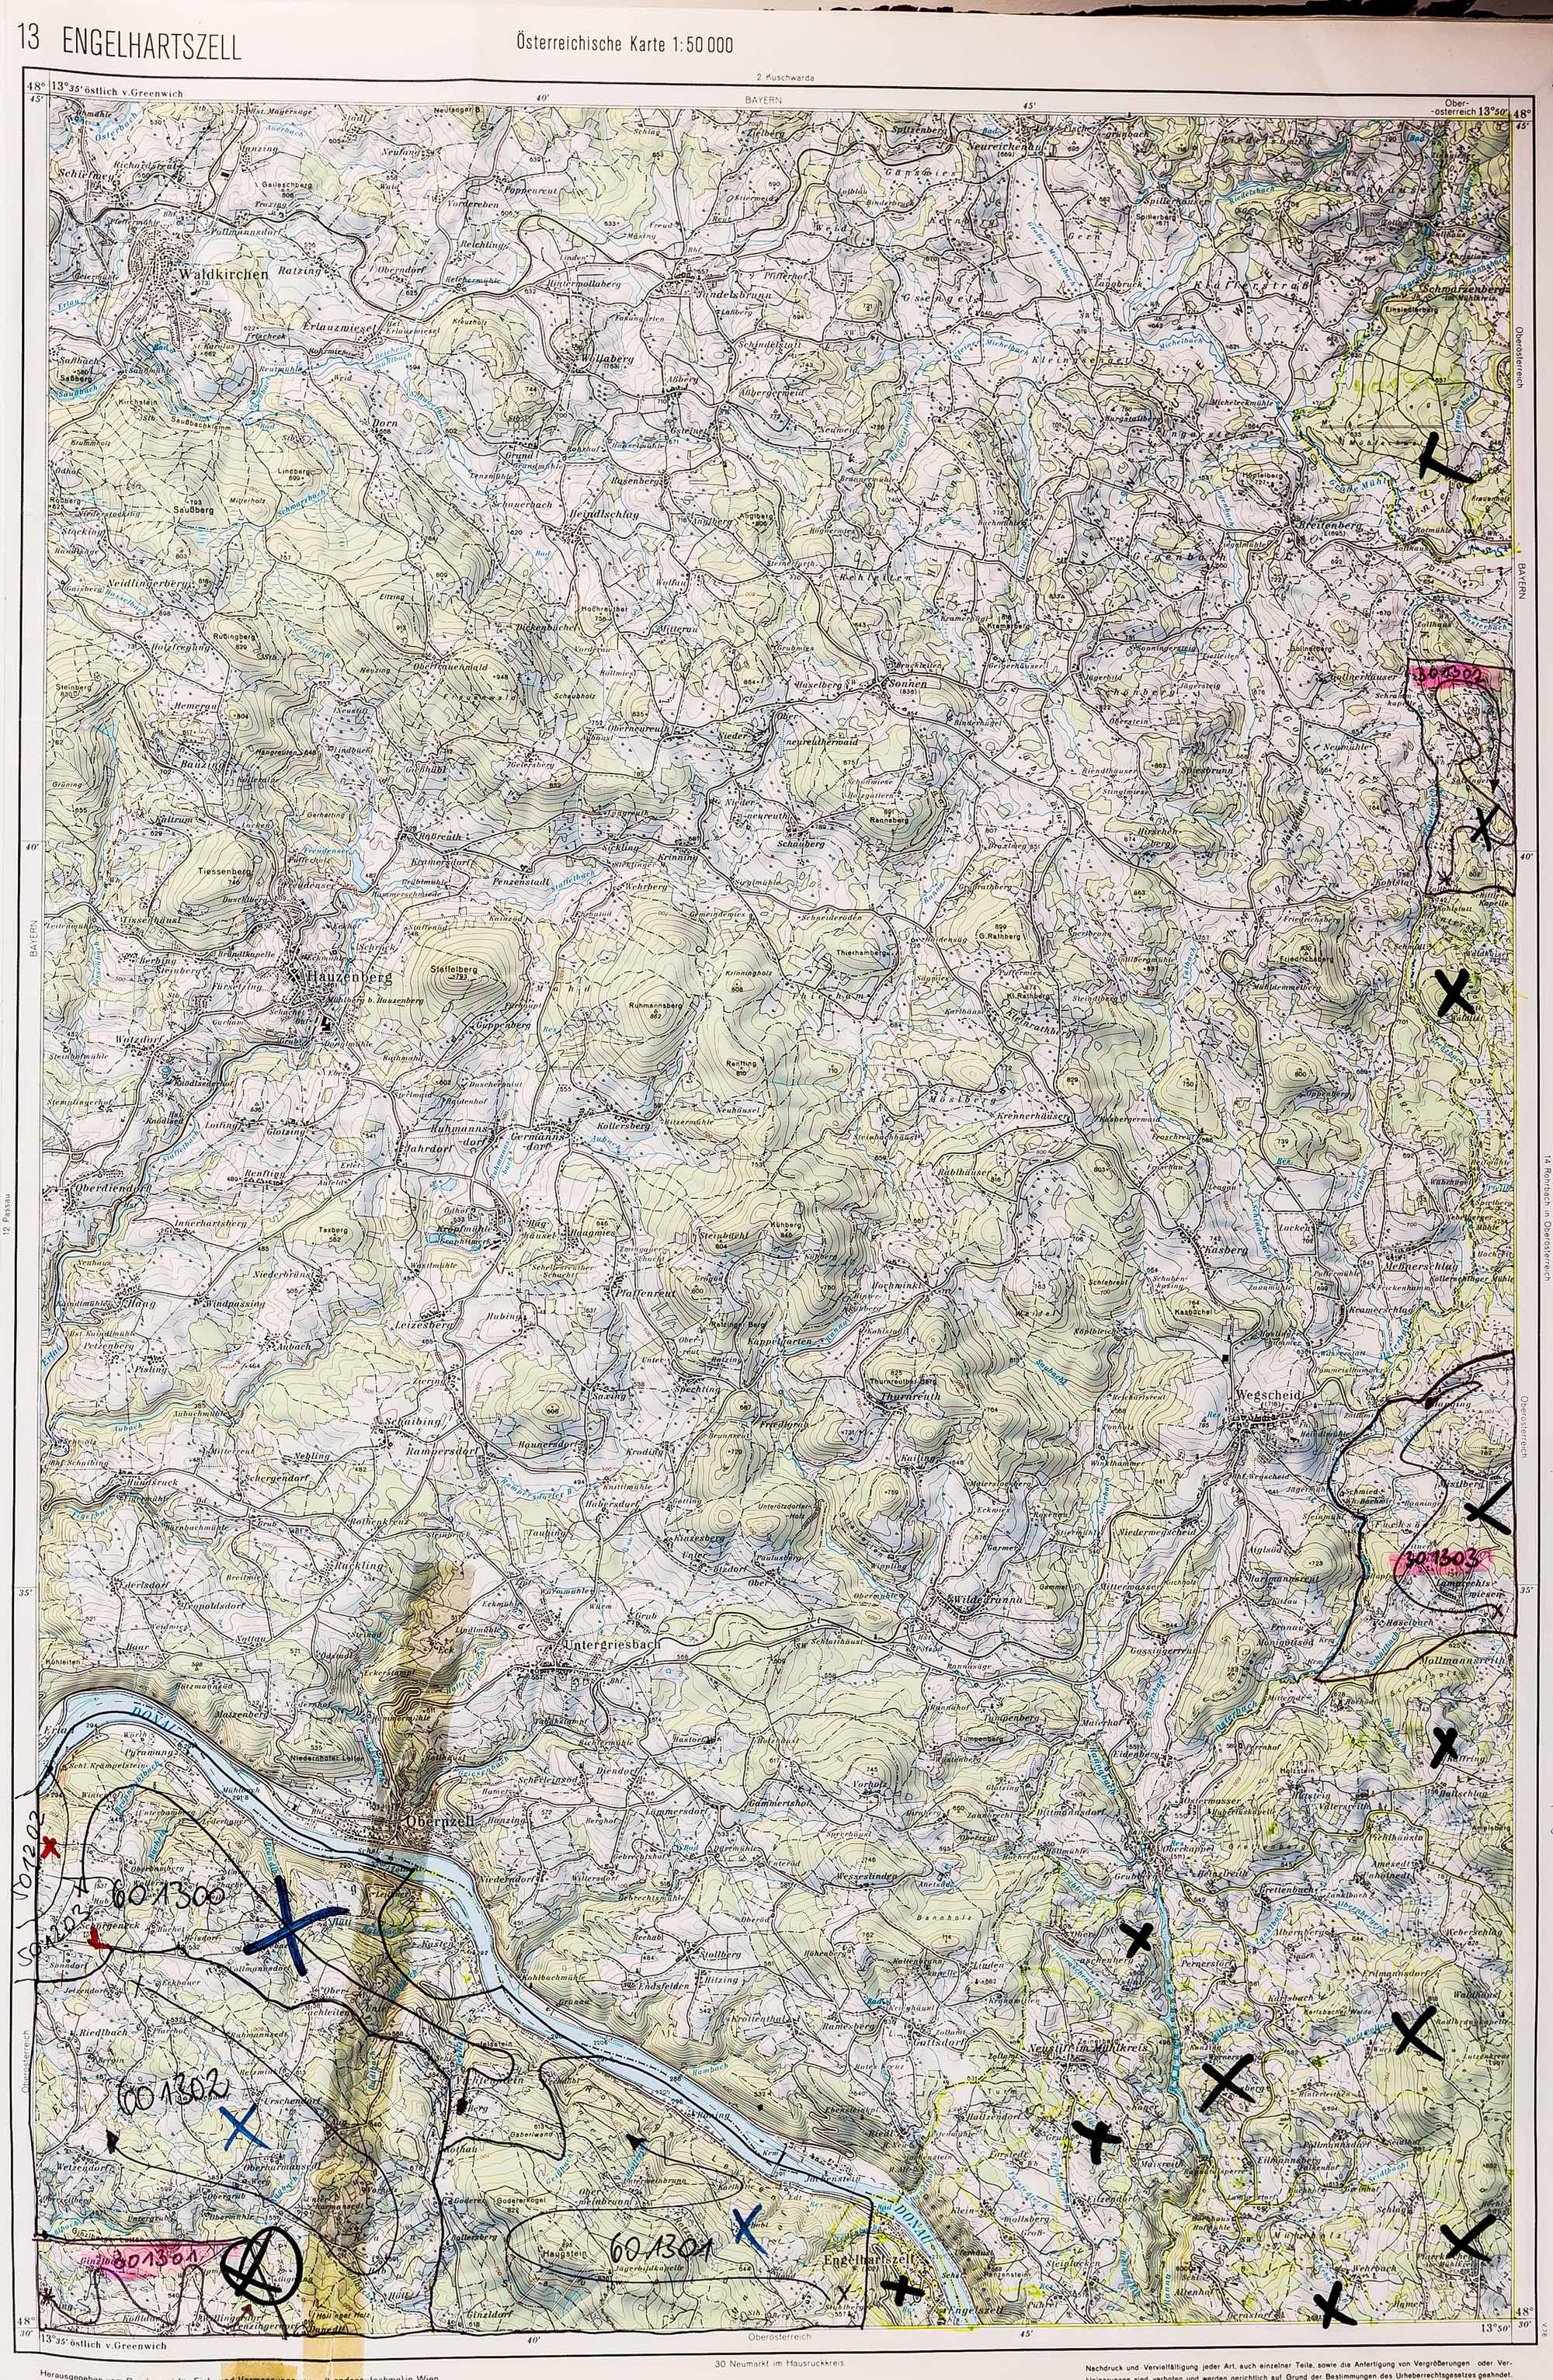 1983-1986 Karte 013